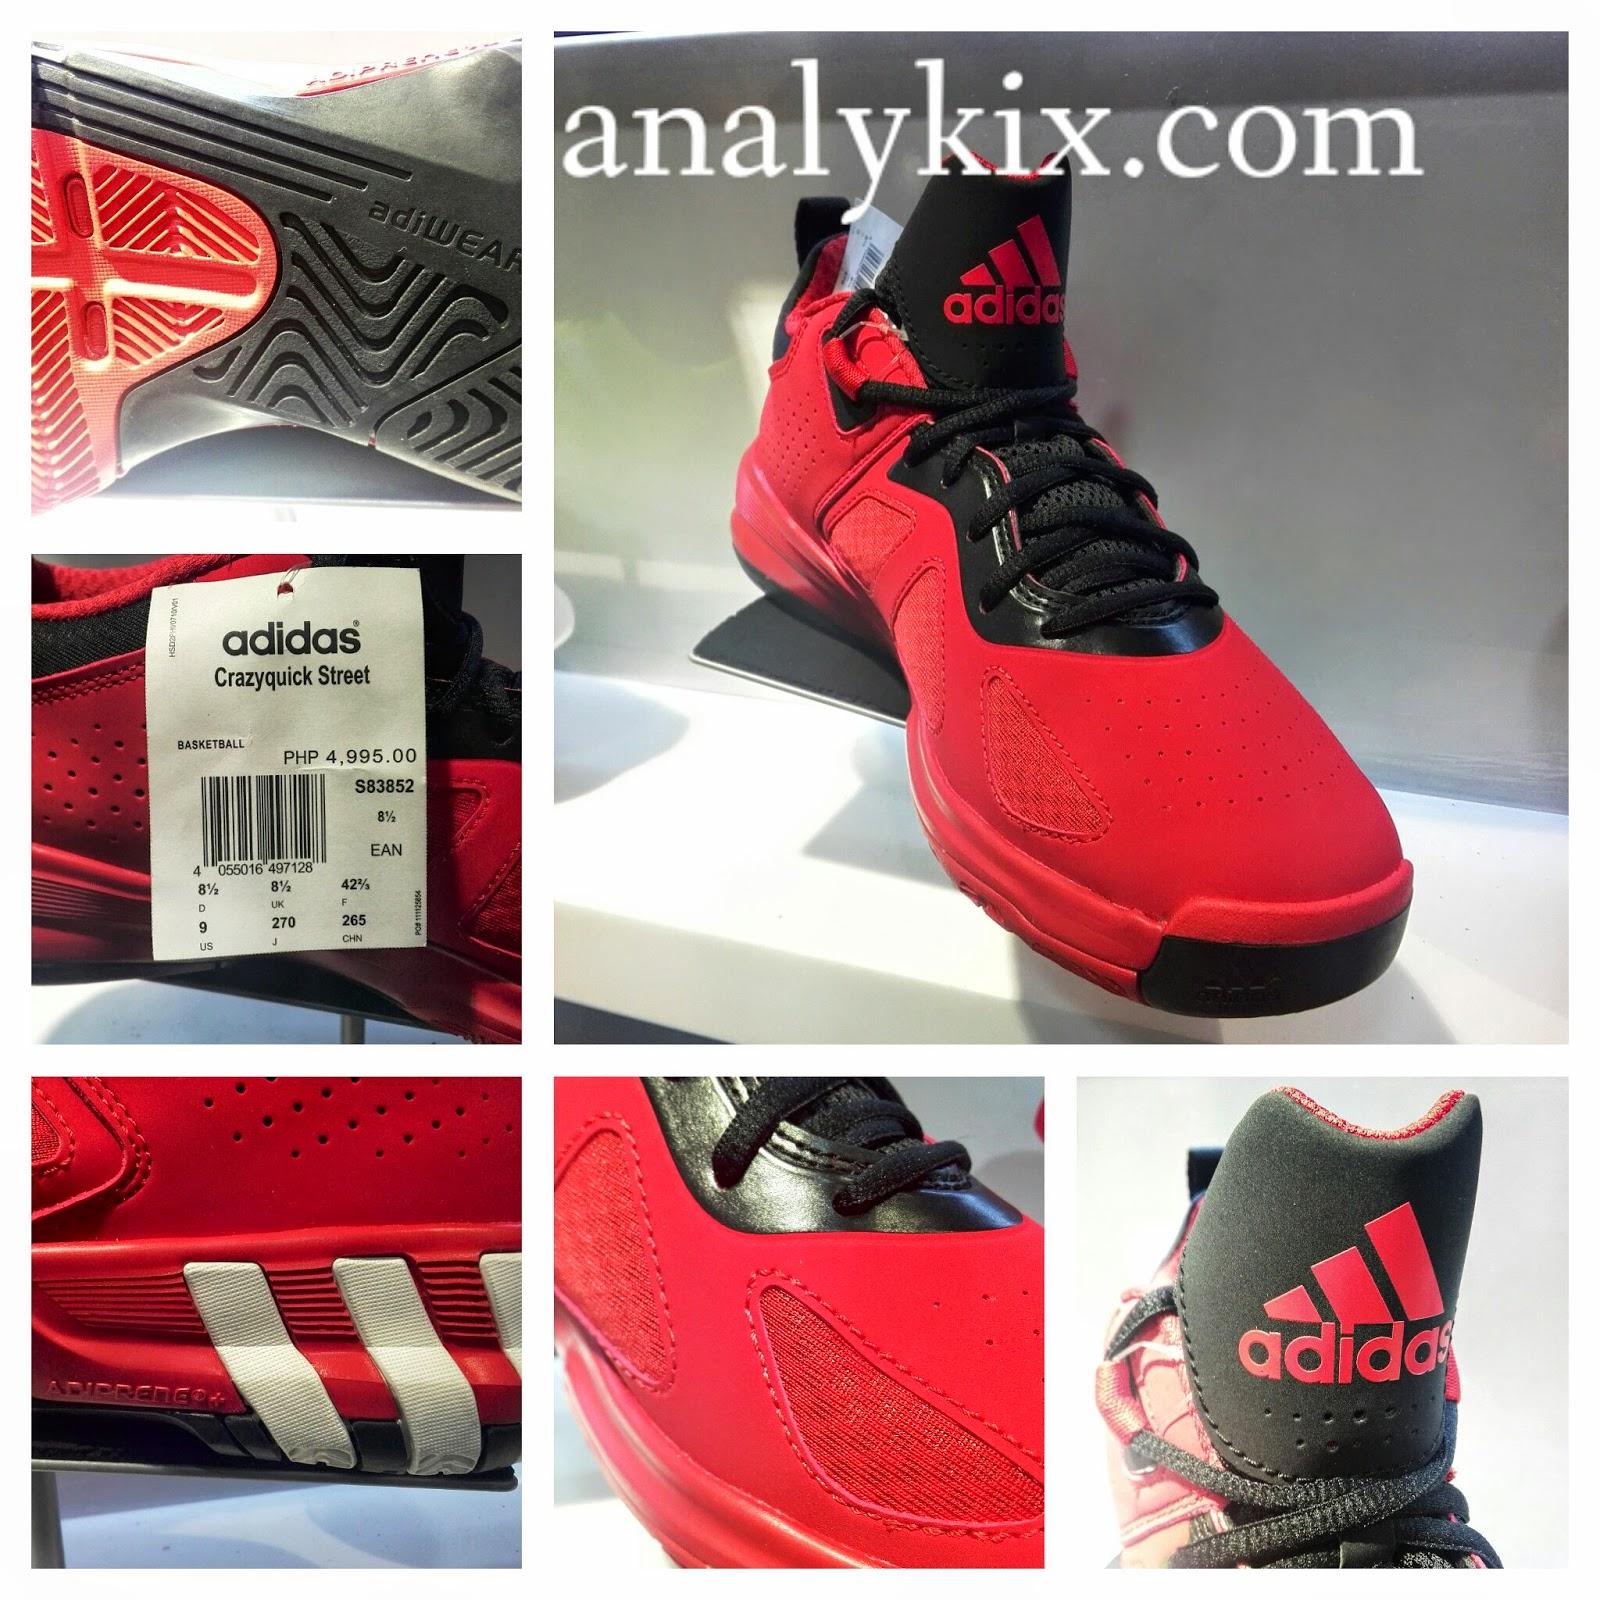 quality design cf138 6708f Adidas Crazyquick Street  Analykix